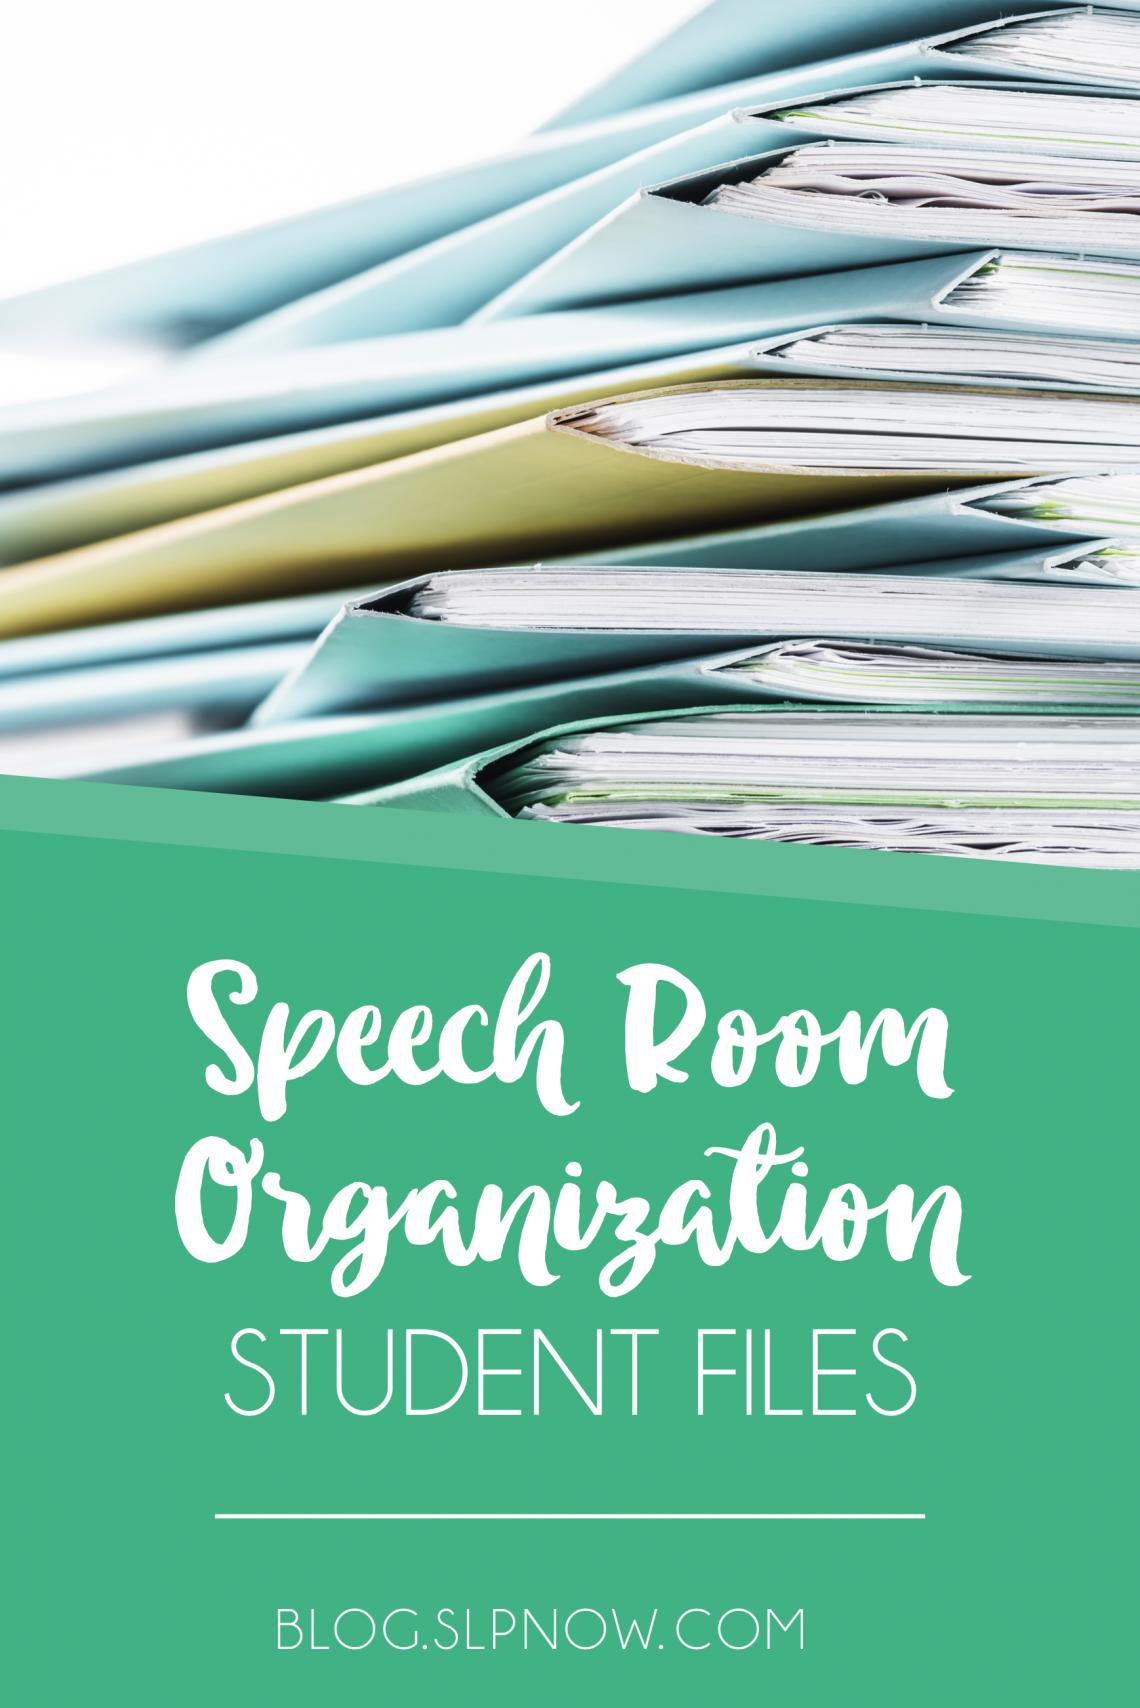 Student File Organization